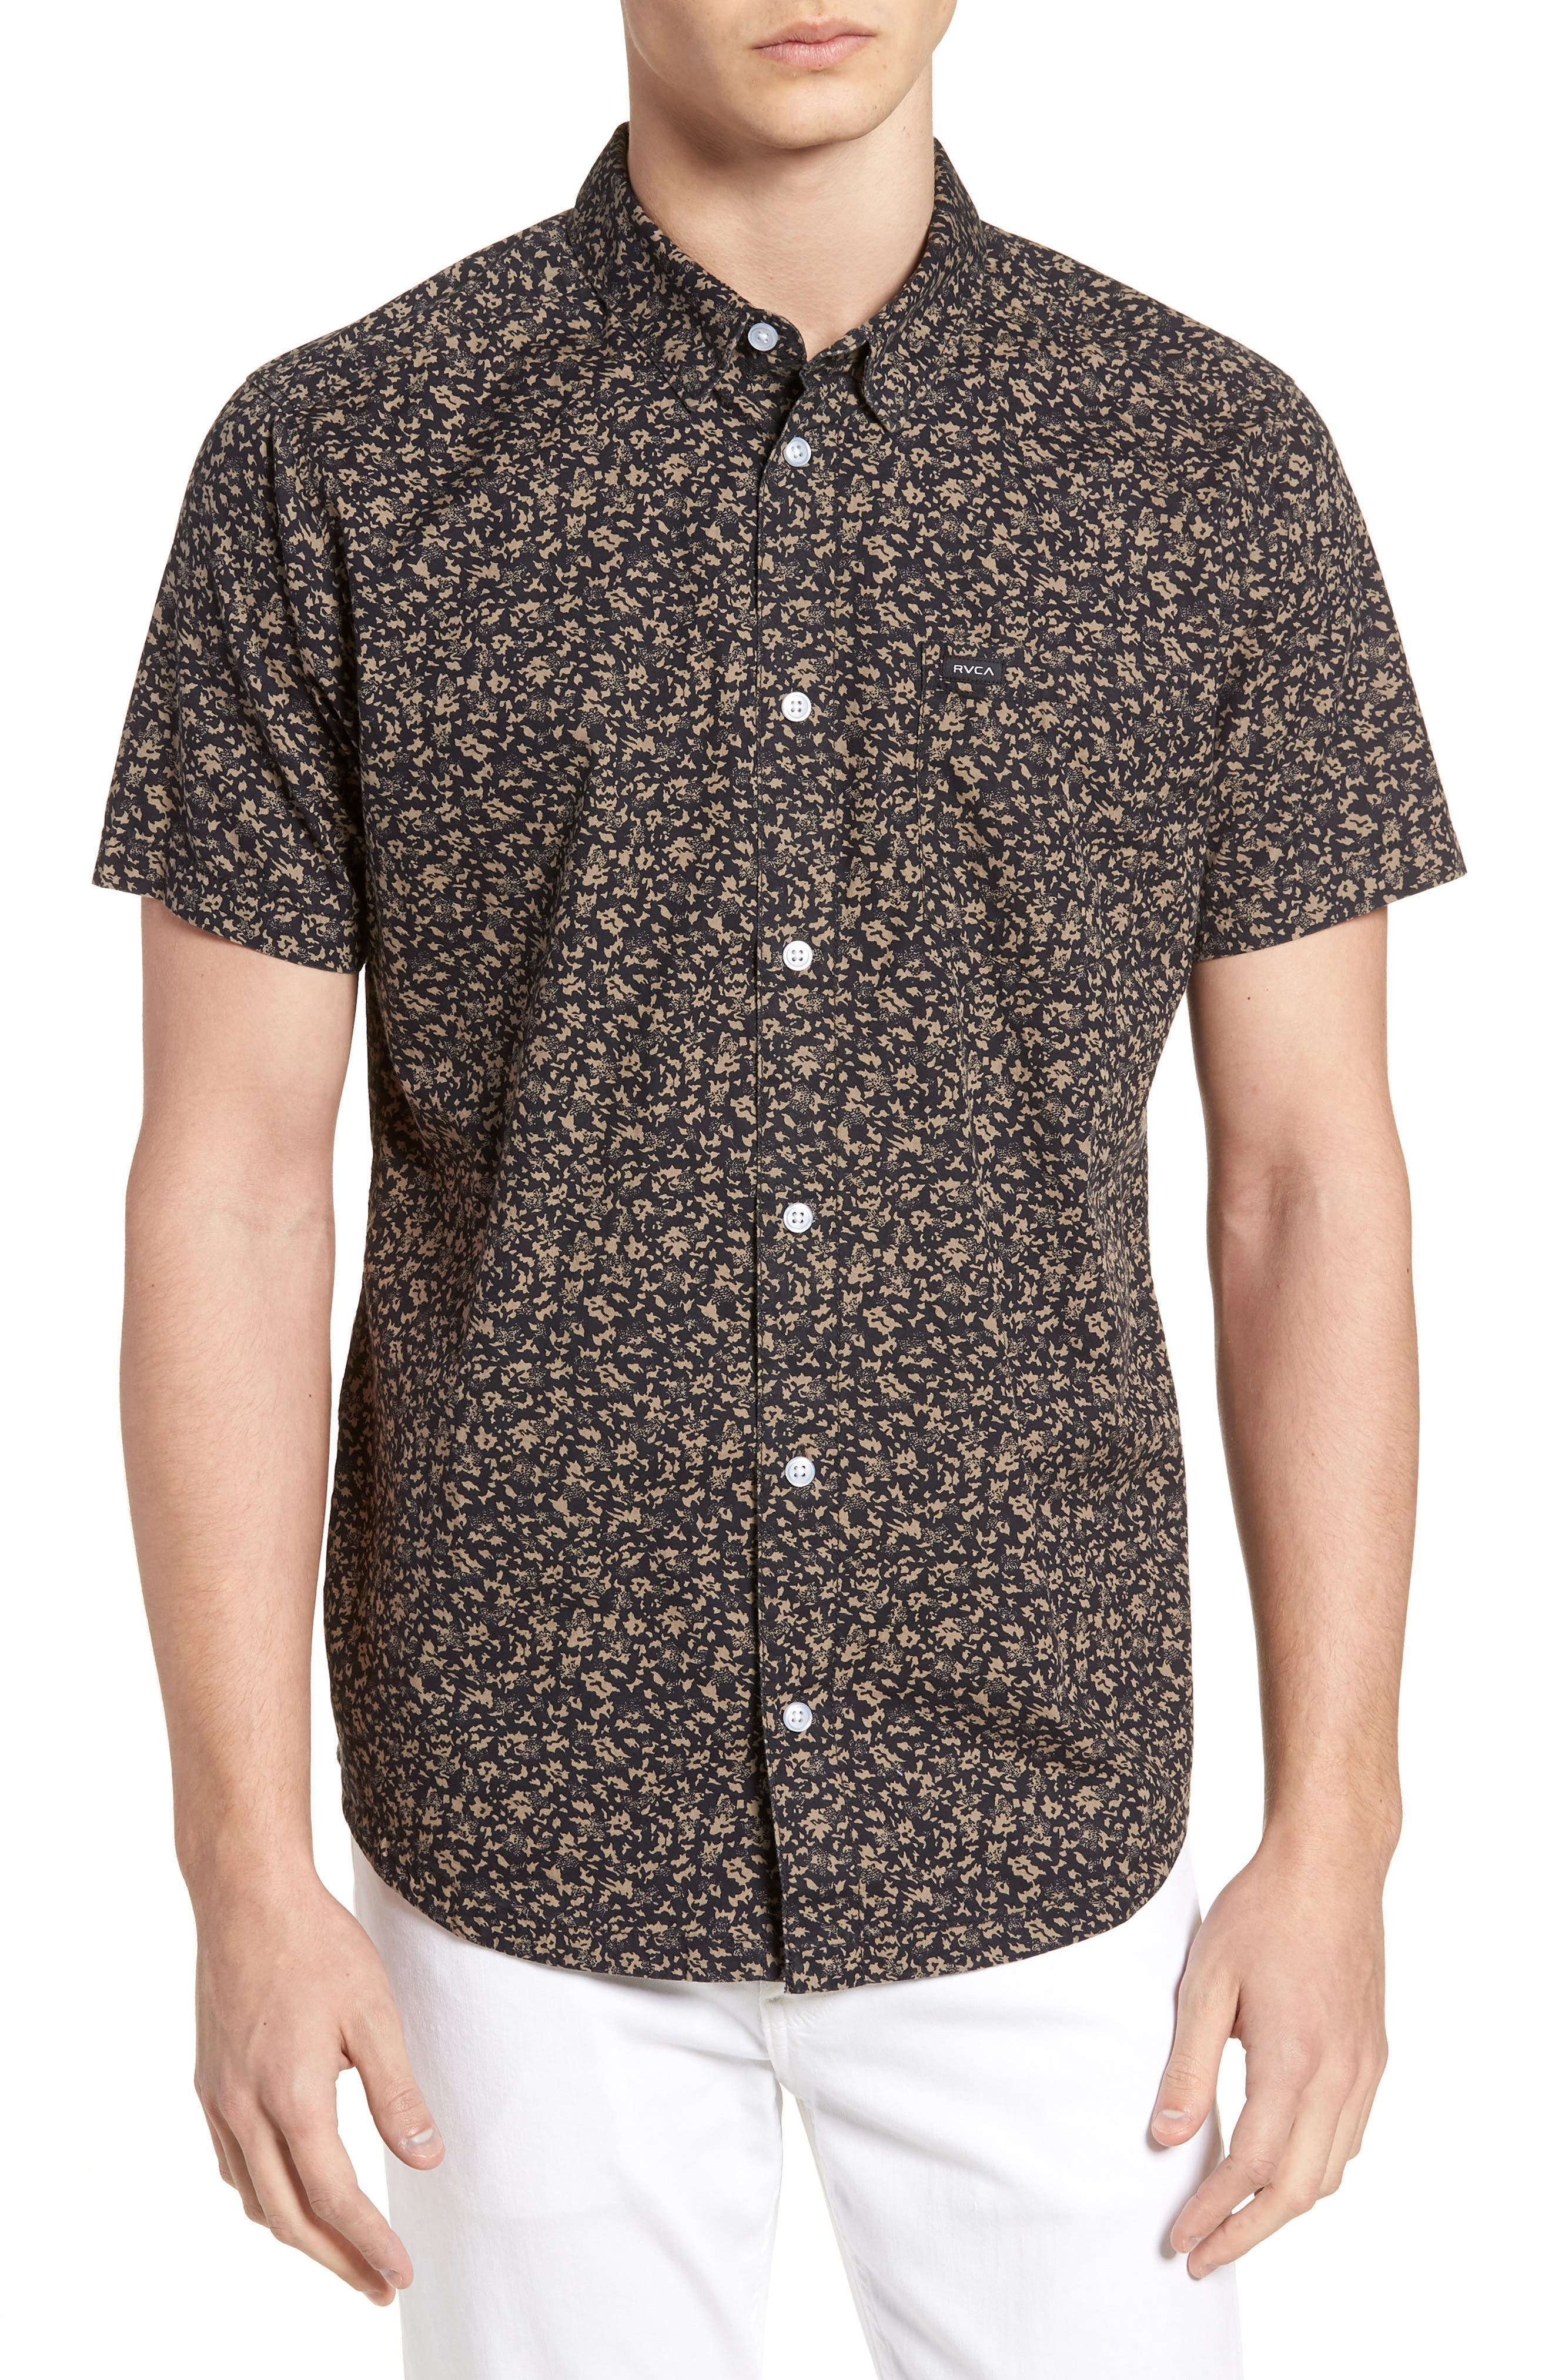 Dresden Woven Shirt,                             Main thumbnail 1, color,                             Pirate Black